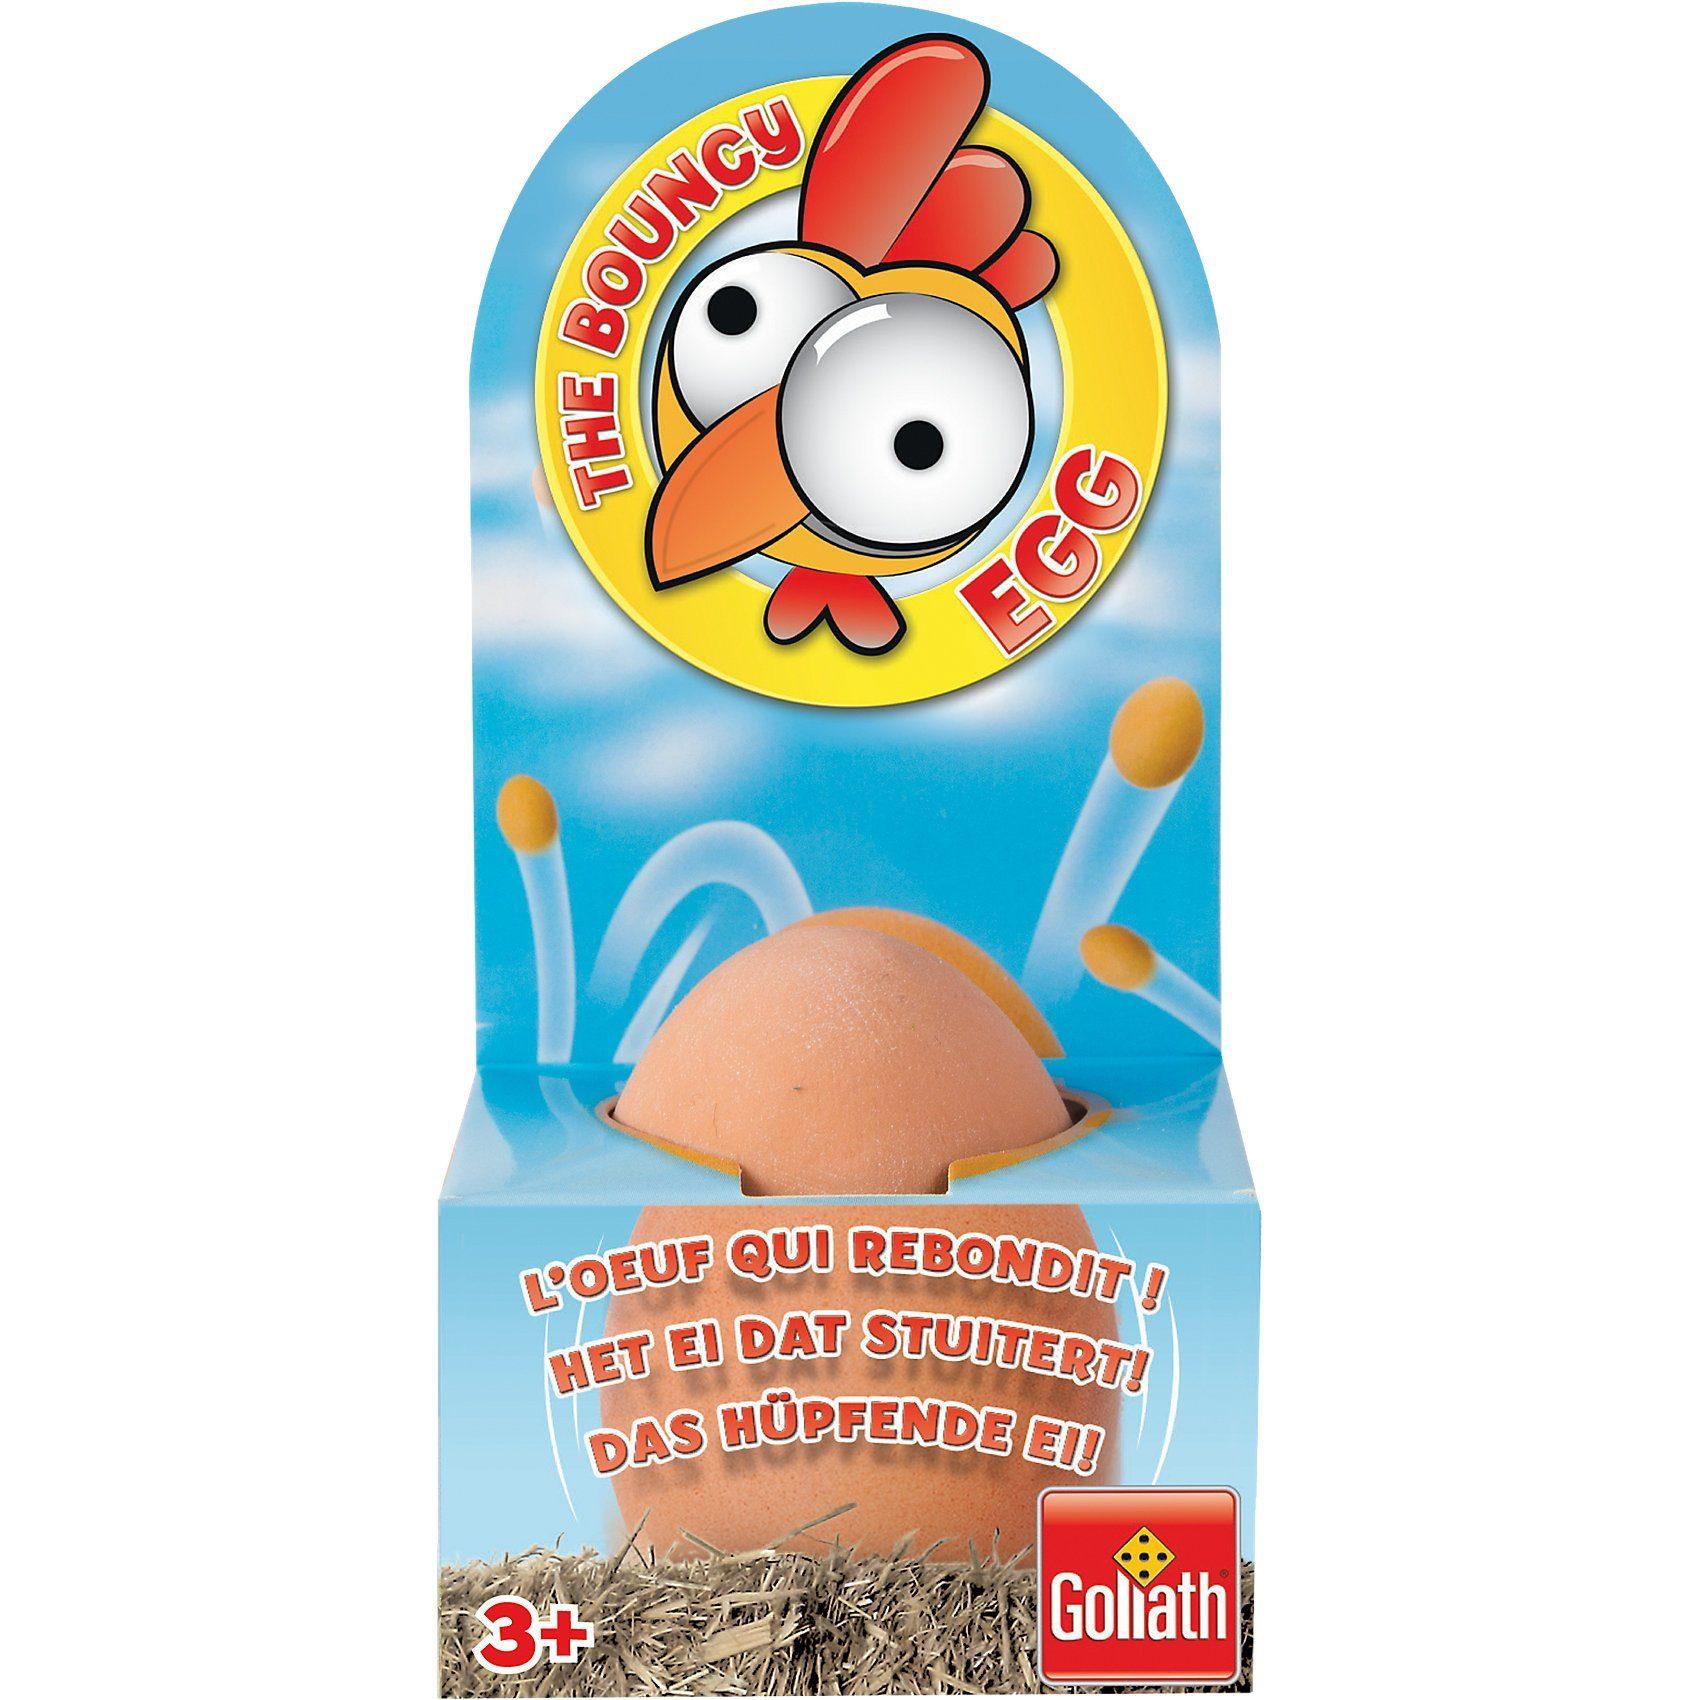 Goliath Bouncy Egg - Das hüpfende Ei